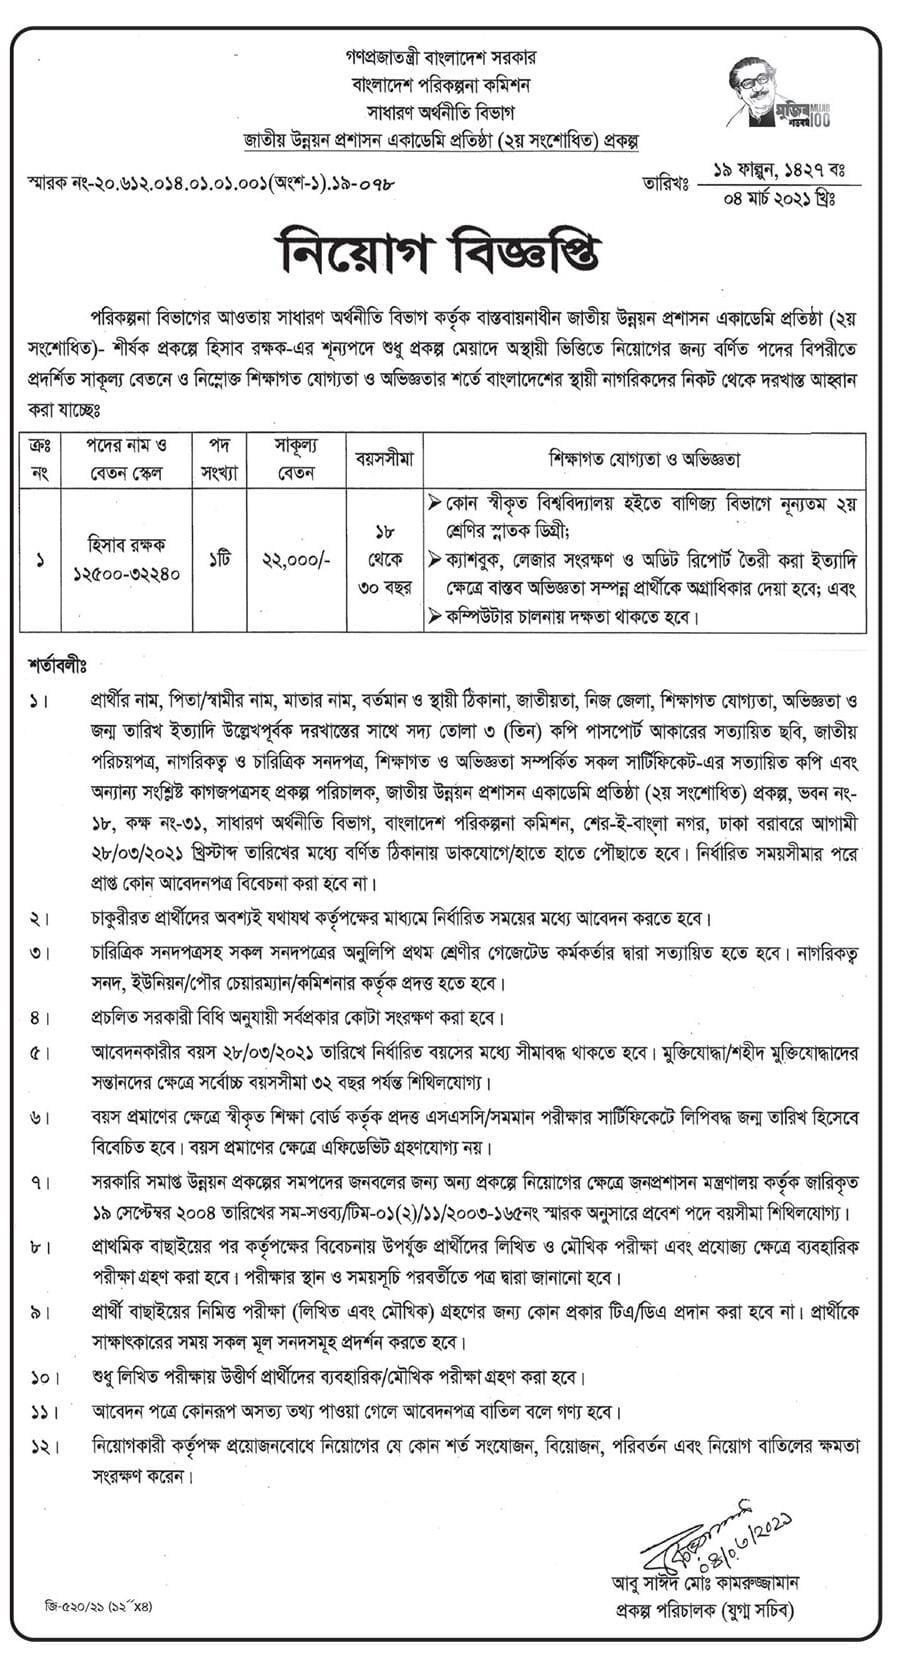 Planning Commission Job Circular 2021